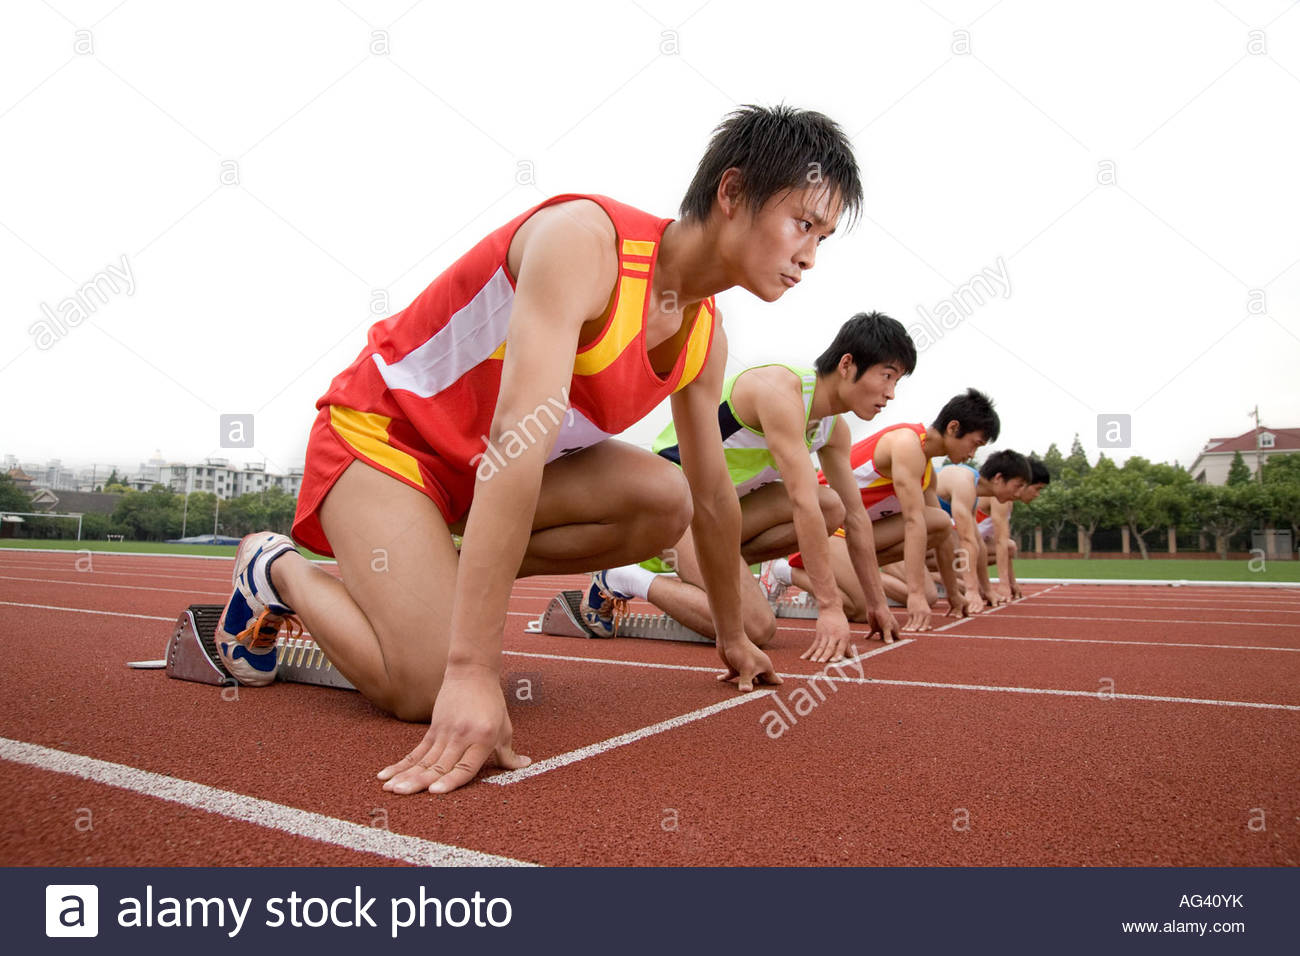 Runners on starting line - Stock Image